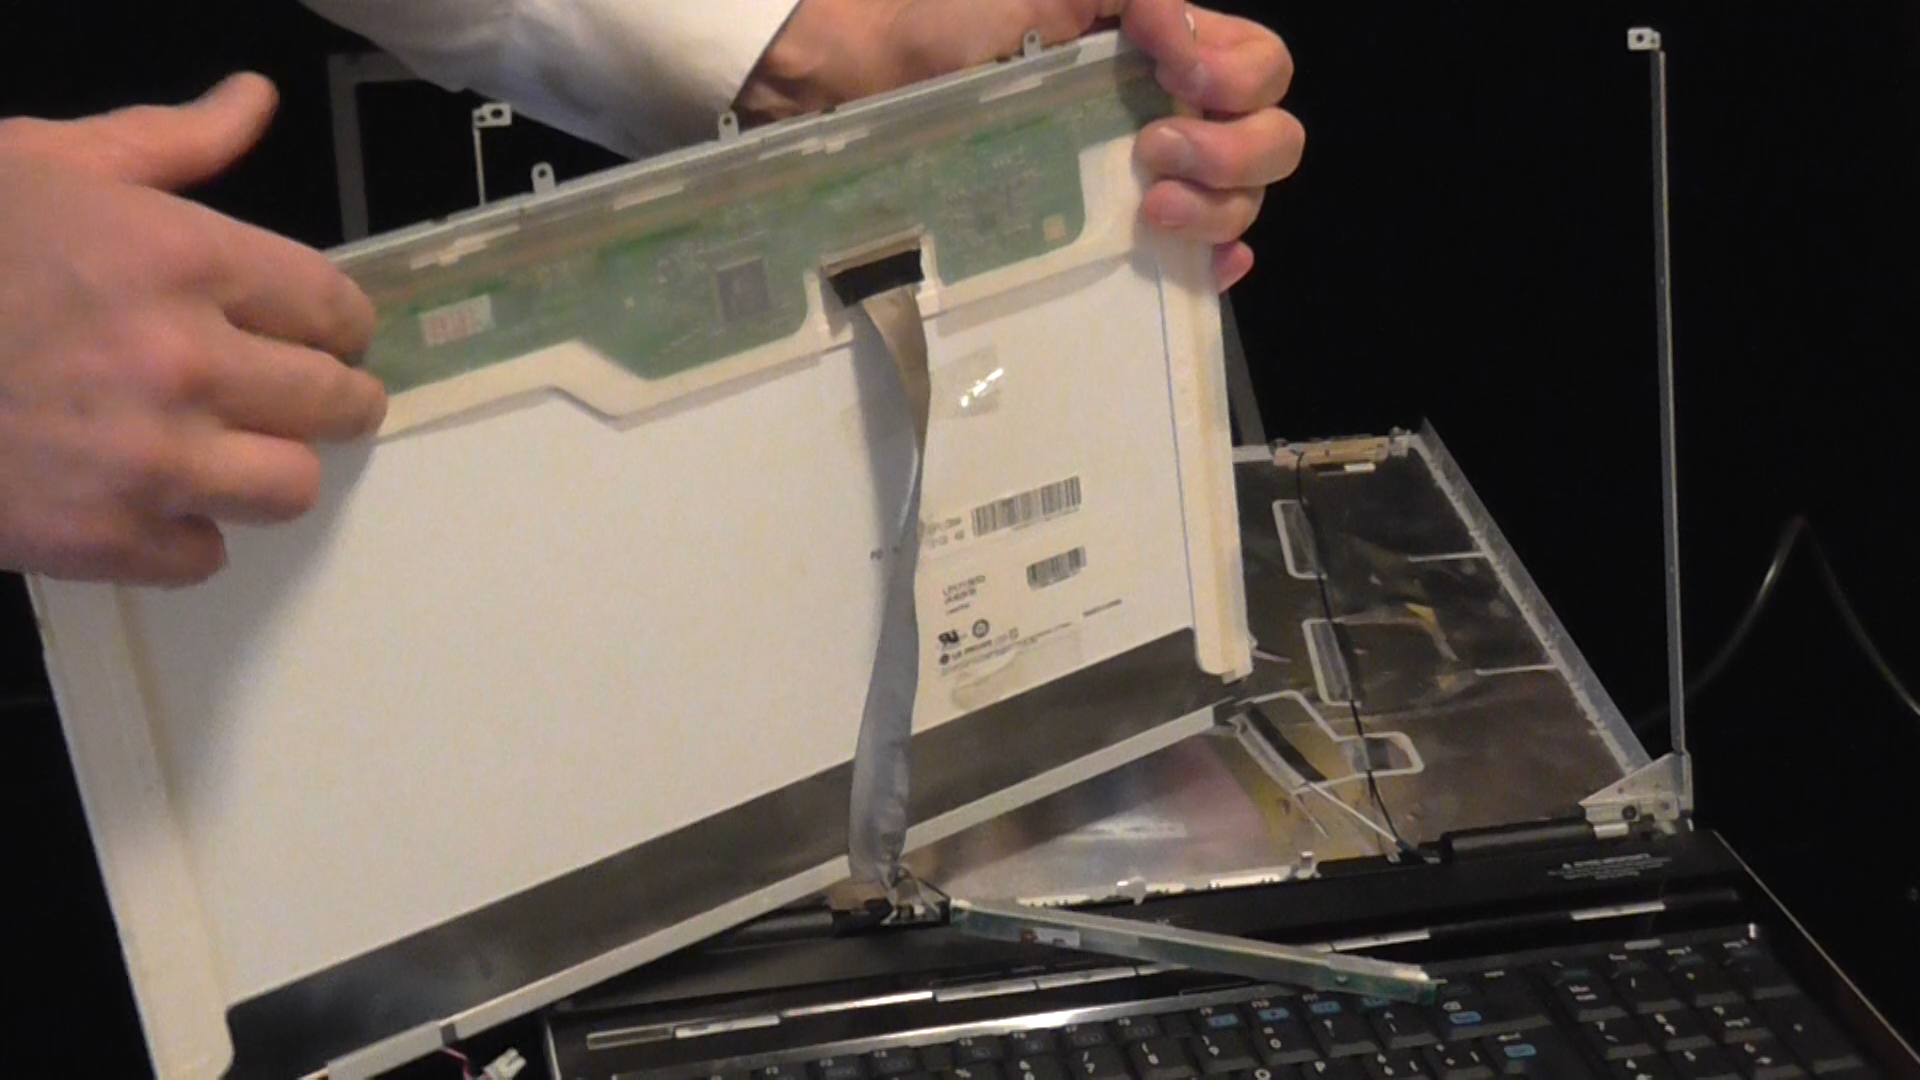 cavo segnake vudeo LCD